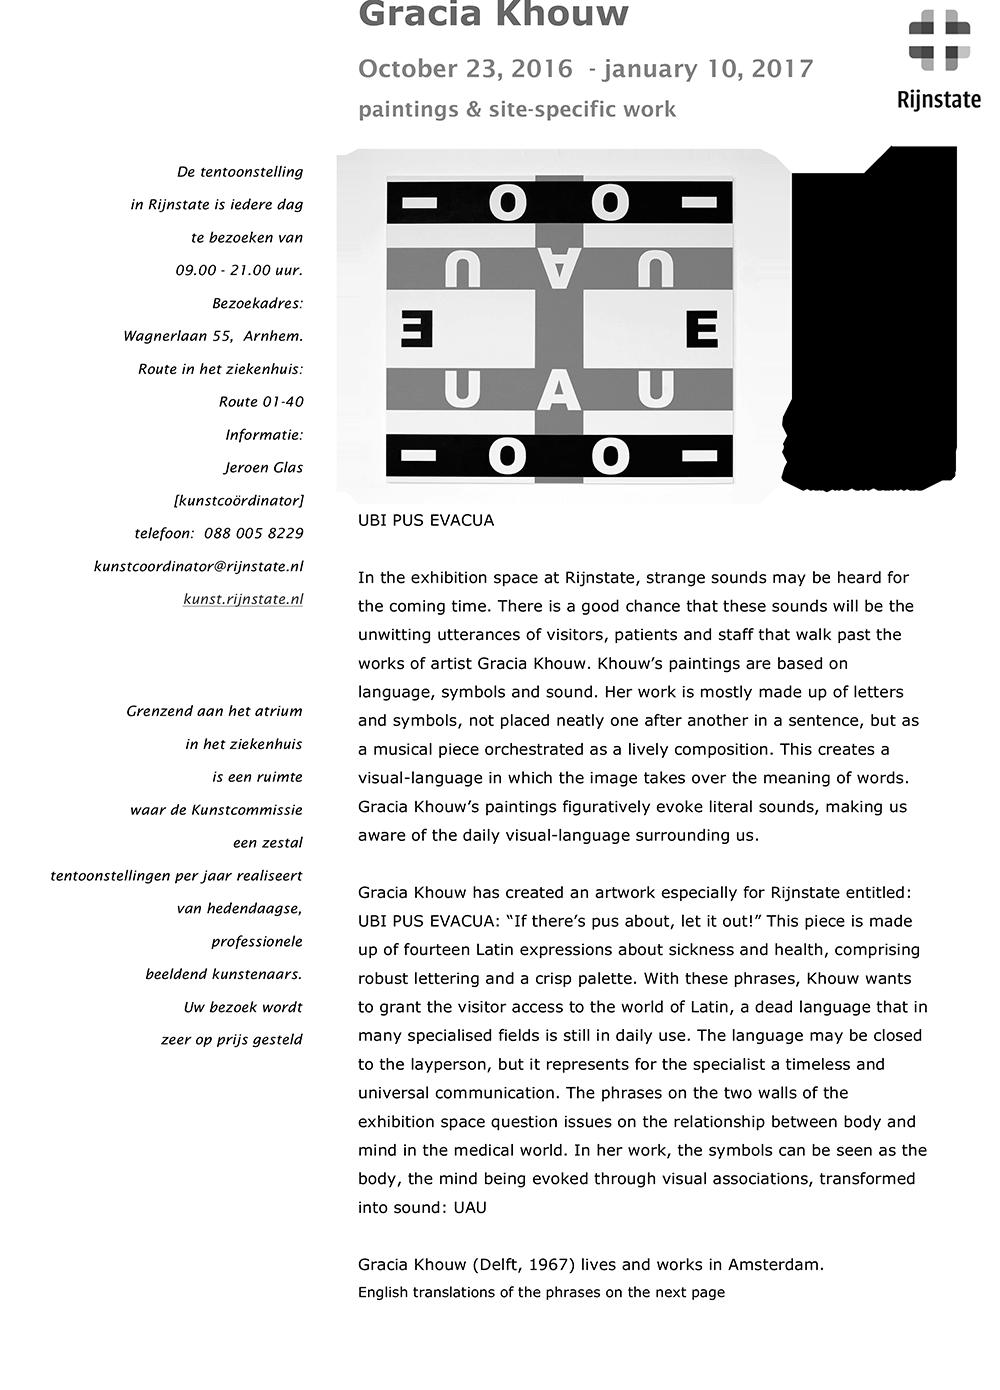 UBI PUS EVACUA-Gracia Khouw-page1.png